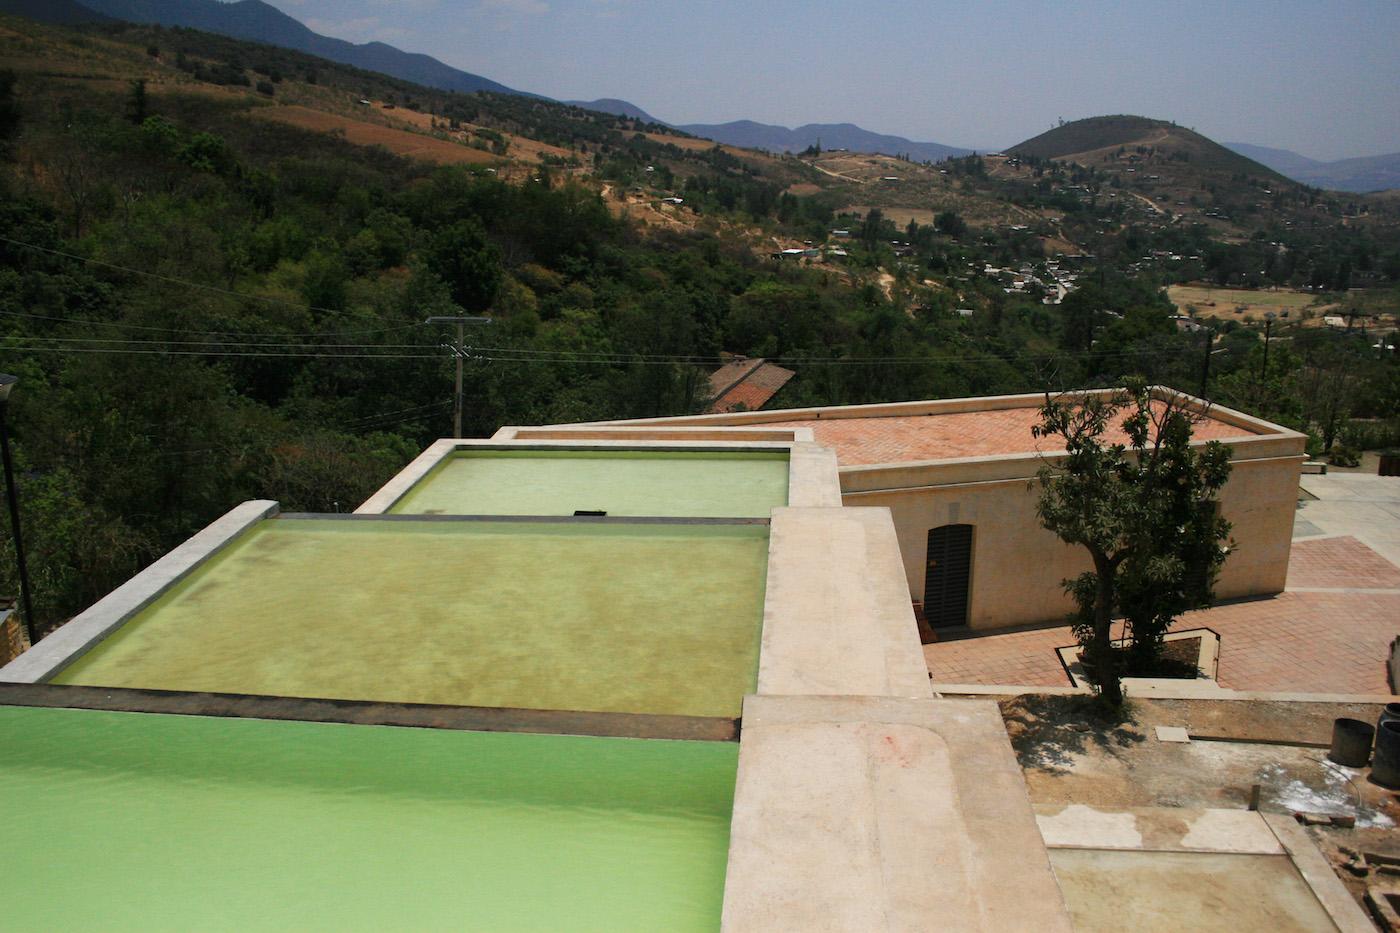 The view across the rooftops of the Centro de las Artes de San Agustín (all photos by and courtesy Rodrigo Suárez)